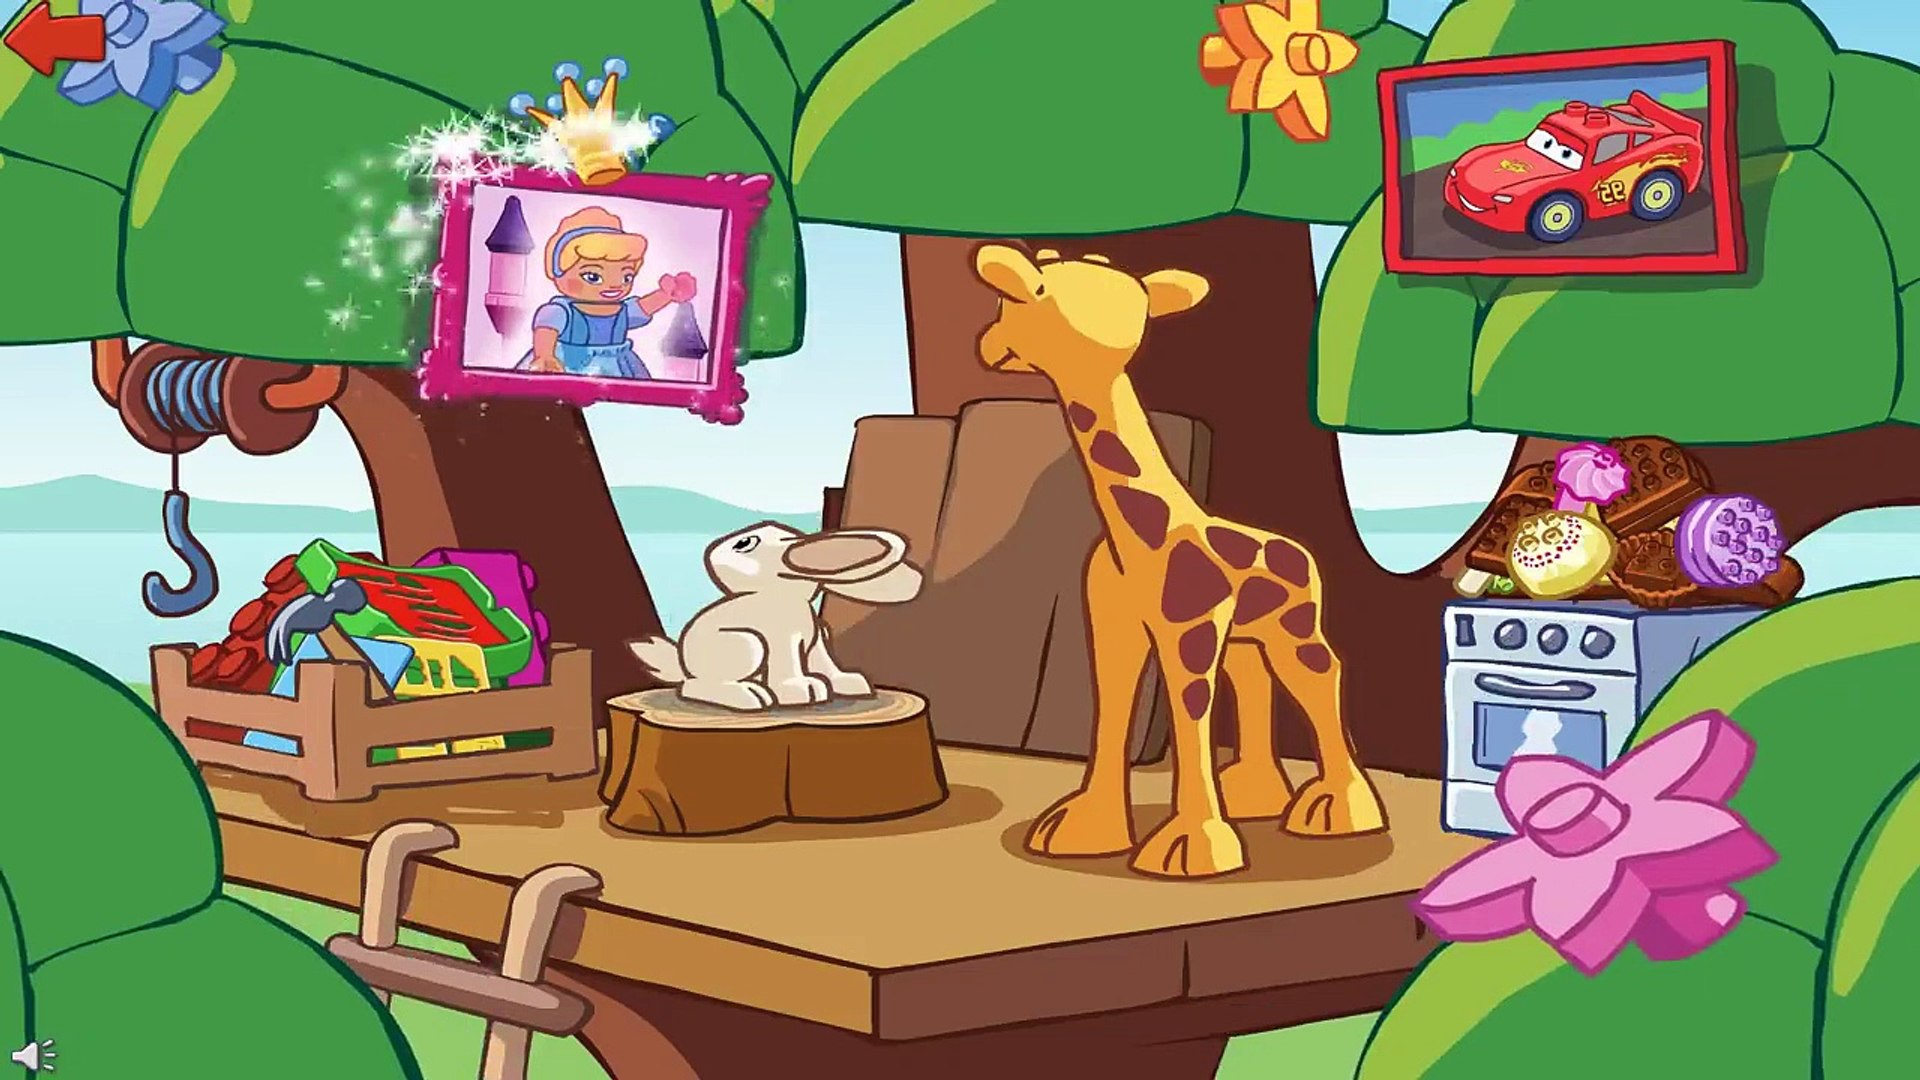 Best Game LEGO DUPLO Cartoon Mini Stories Fun Lego Education Cartoon_Games ! Kids Toddlers ! 3d kids